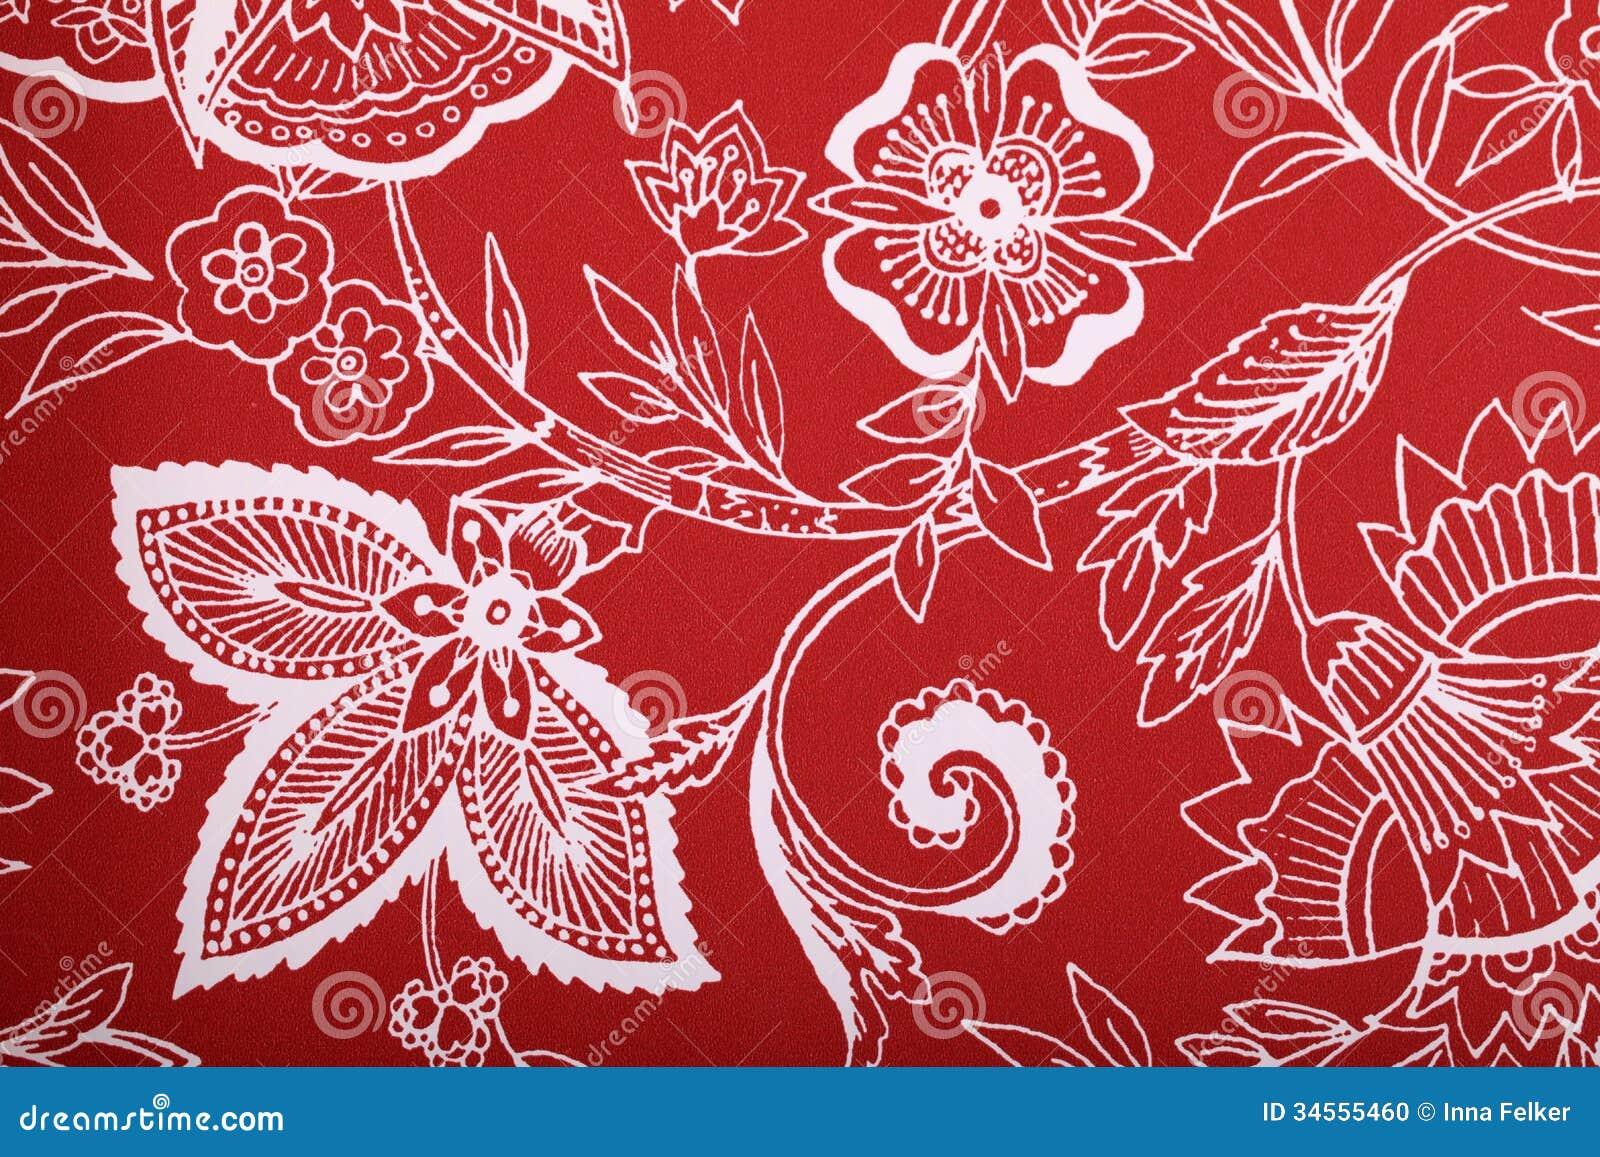 Red vintage wallpaper stock photo. Image of grunge ...